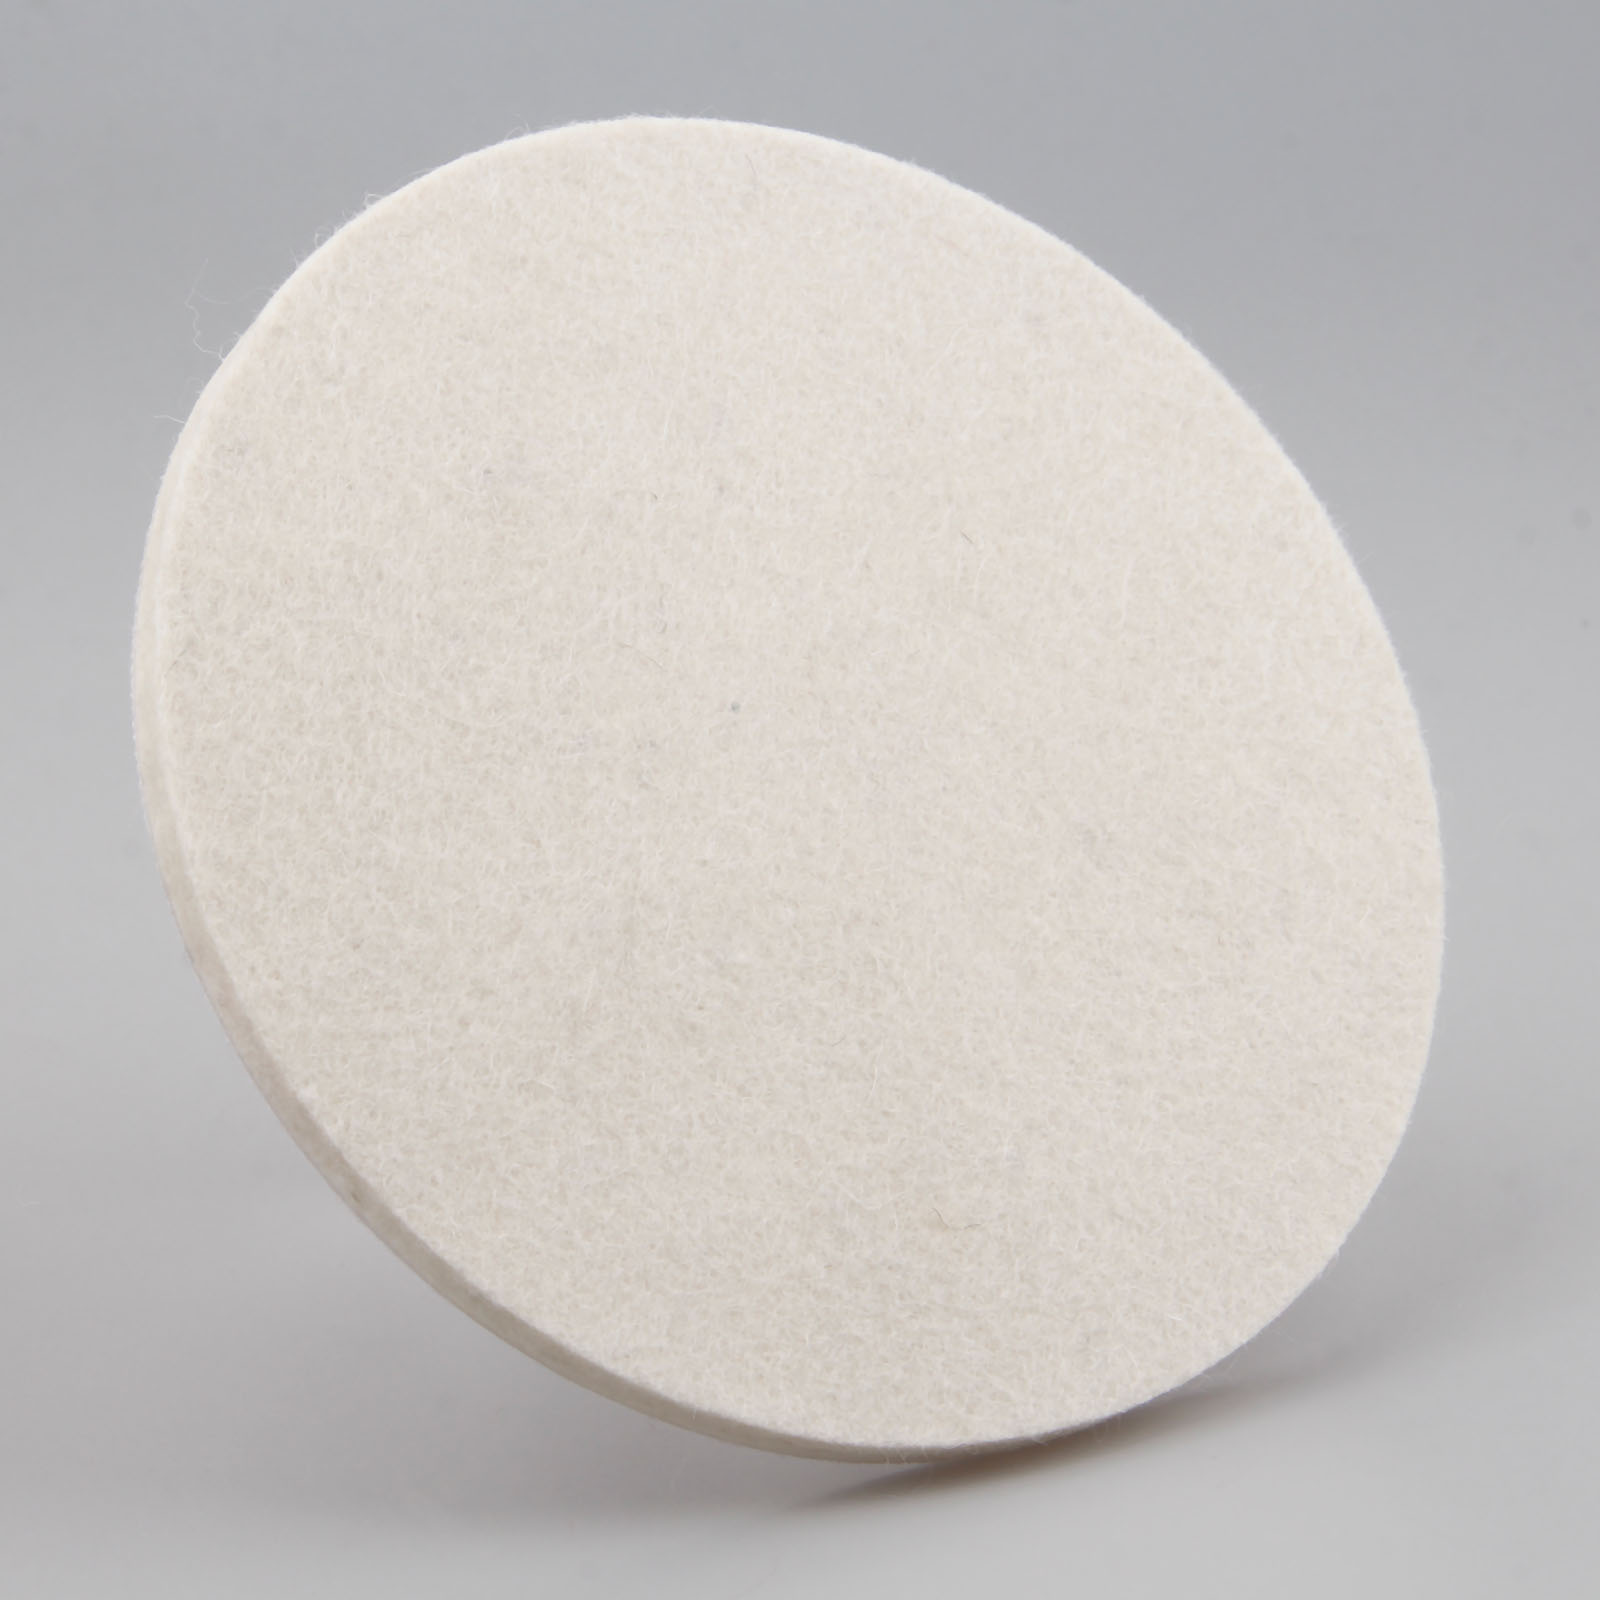 DRELD 1Pc 6 Inch 150mm Polishing Pad Wool Waxing Buffing Grinding Polishing Wheel Plate Polisher Disc Pad For Dremel Rotary Tool